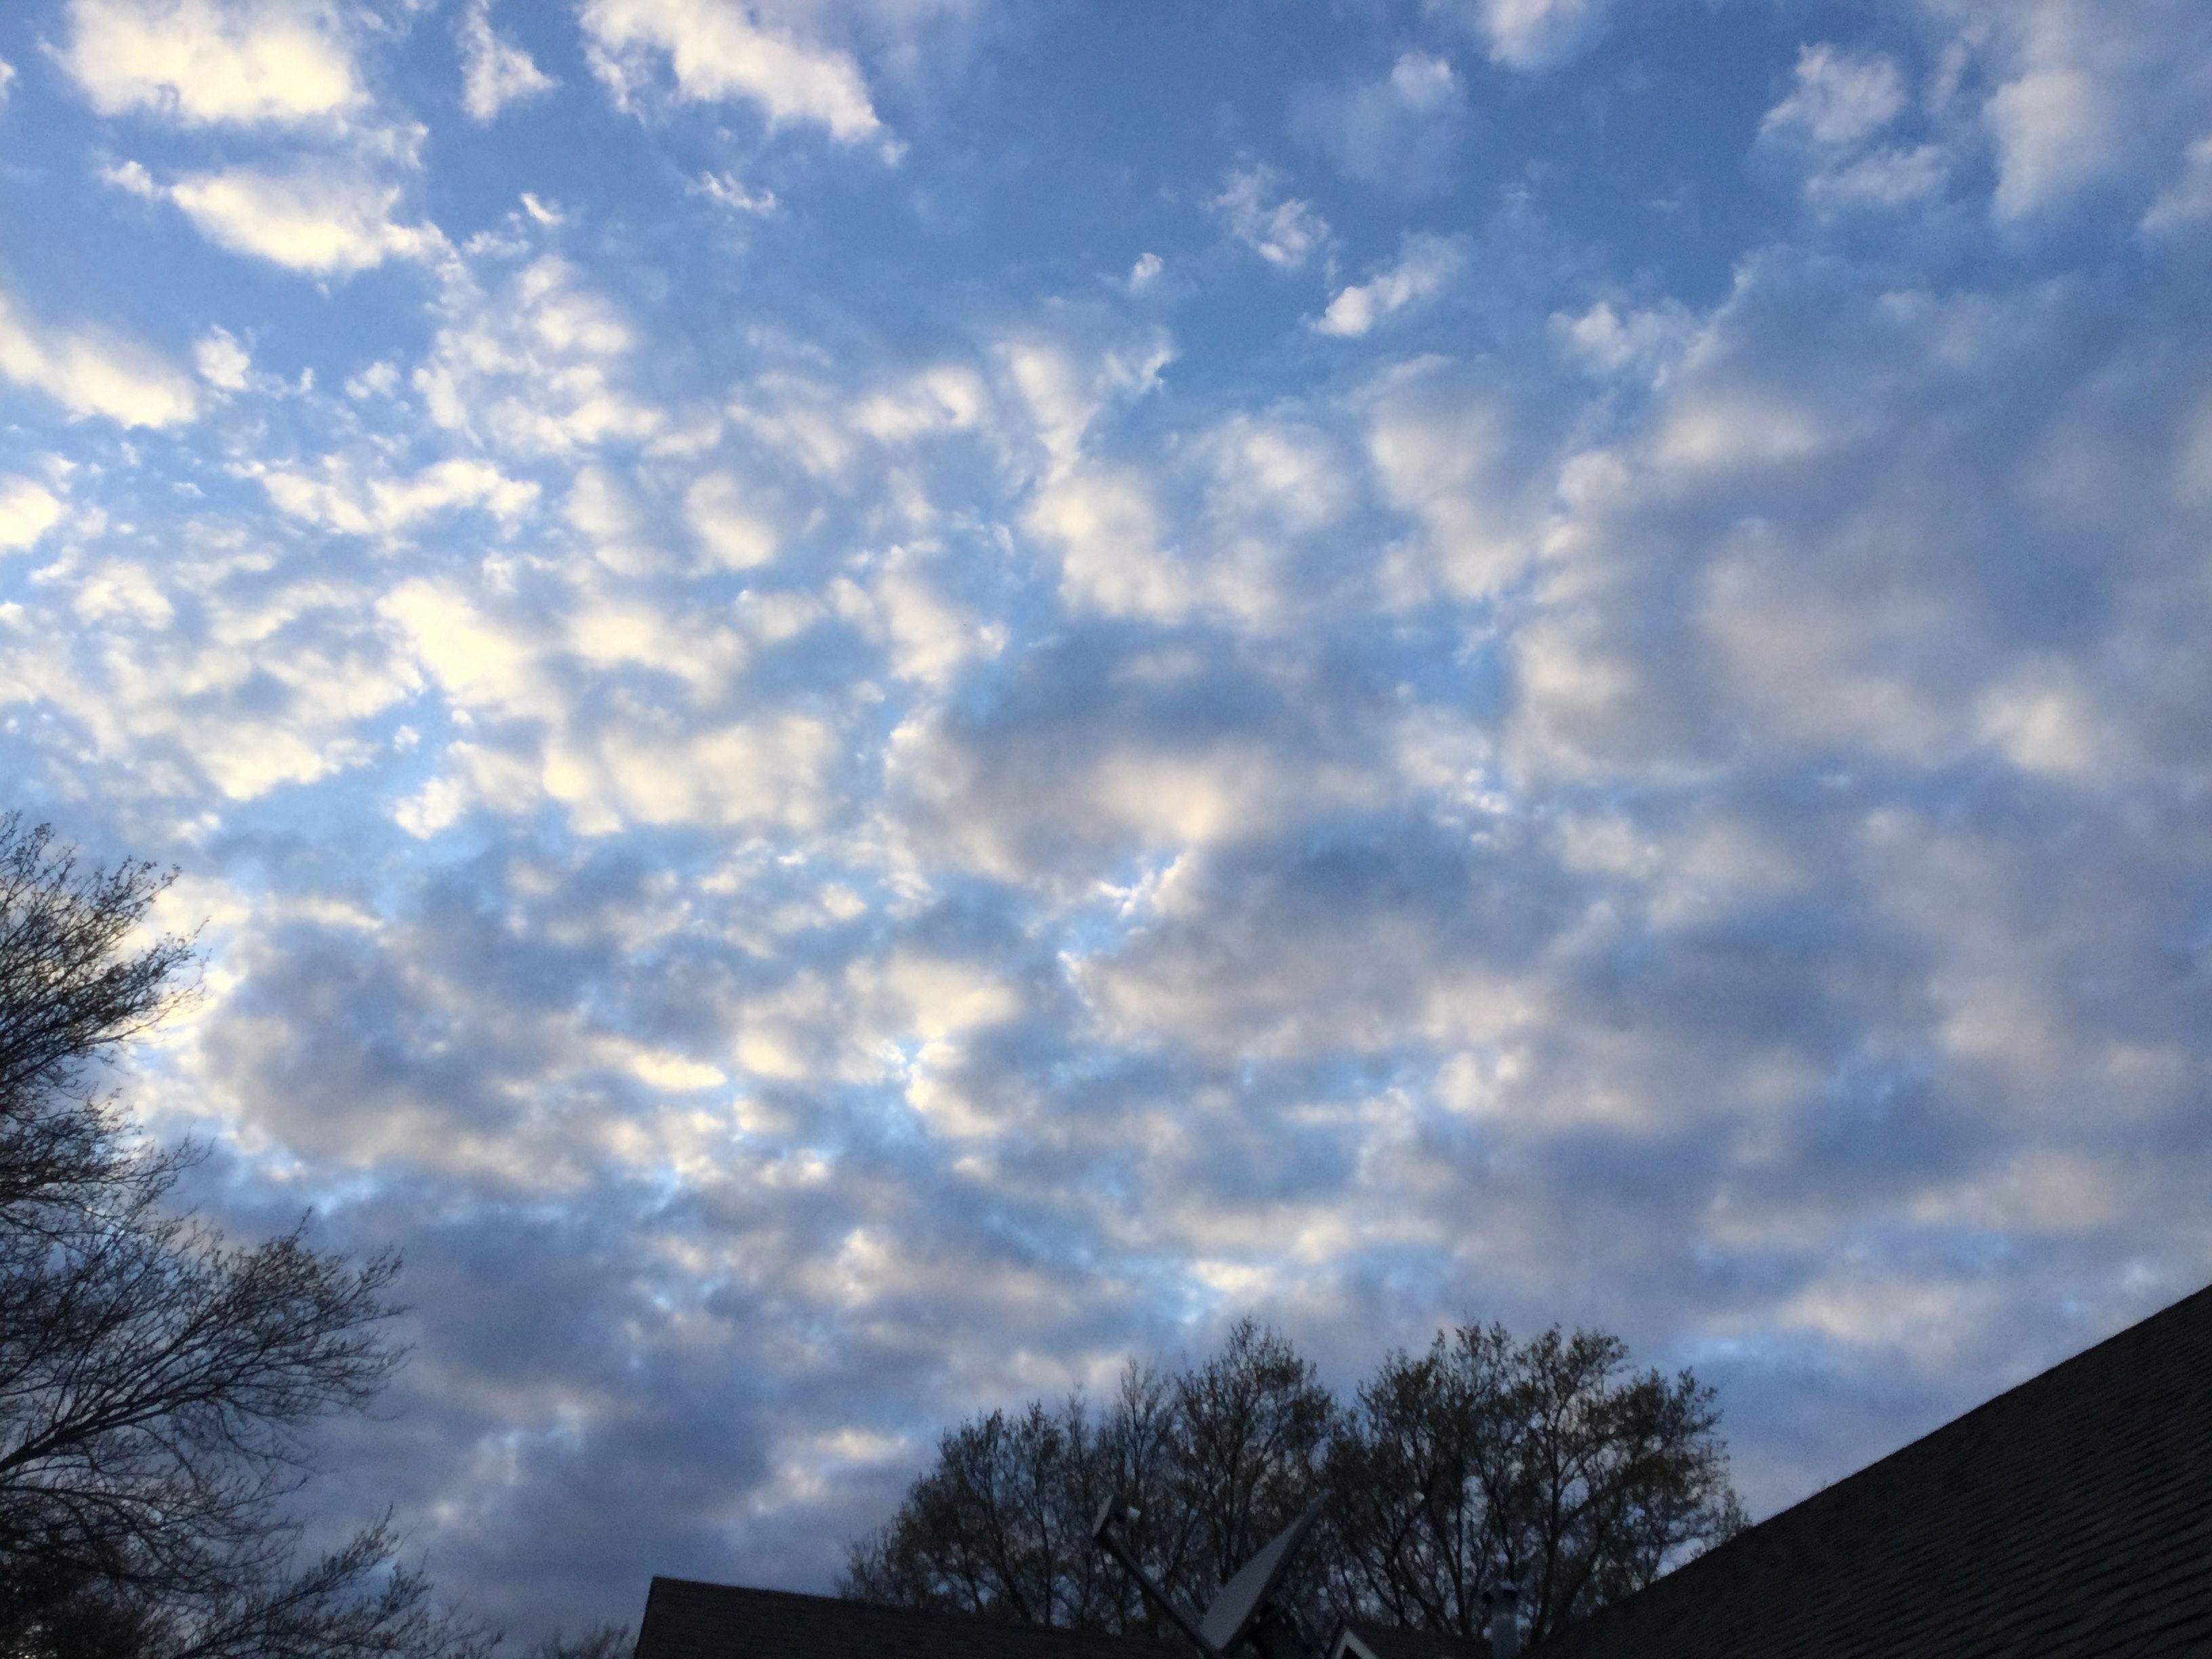 Pin by Stevie Mafuki Wonder on HSH Outdoor, Clouds